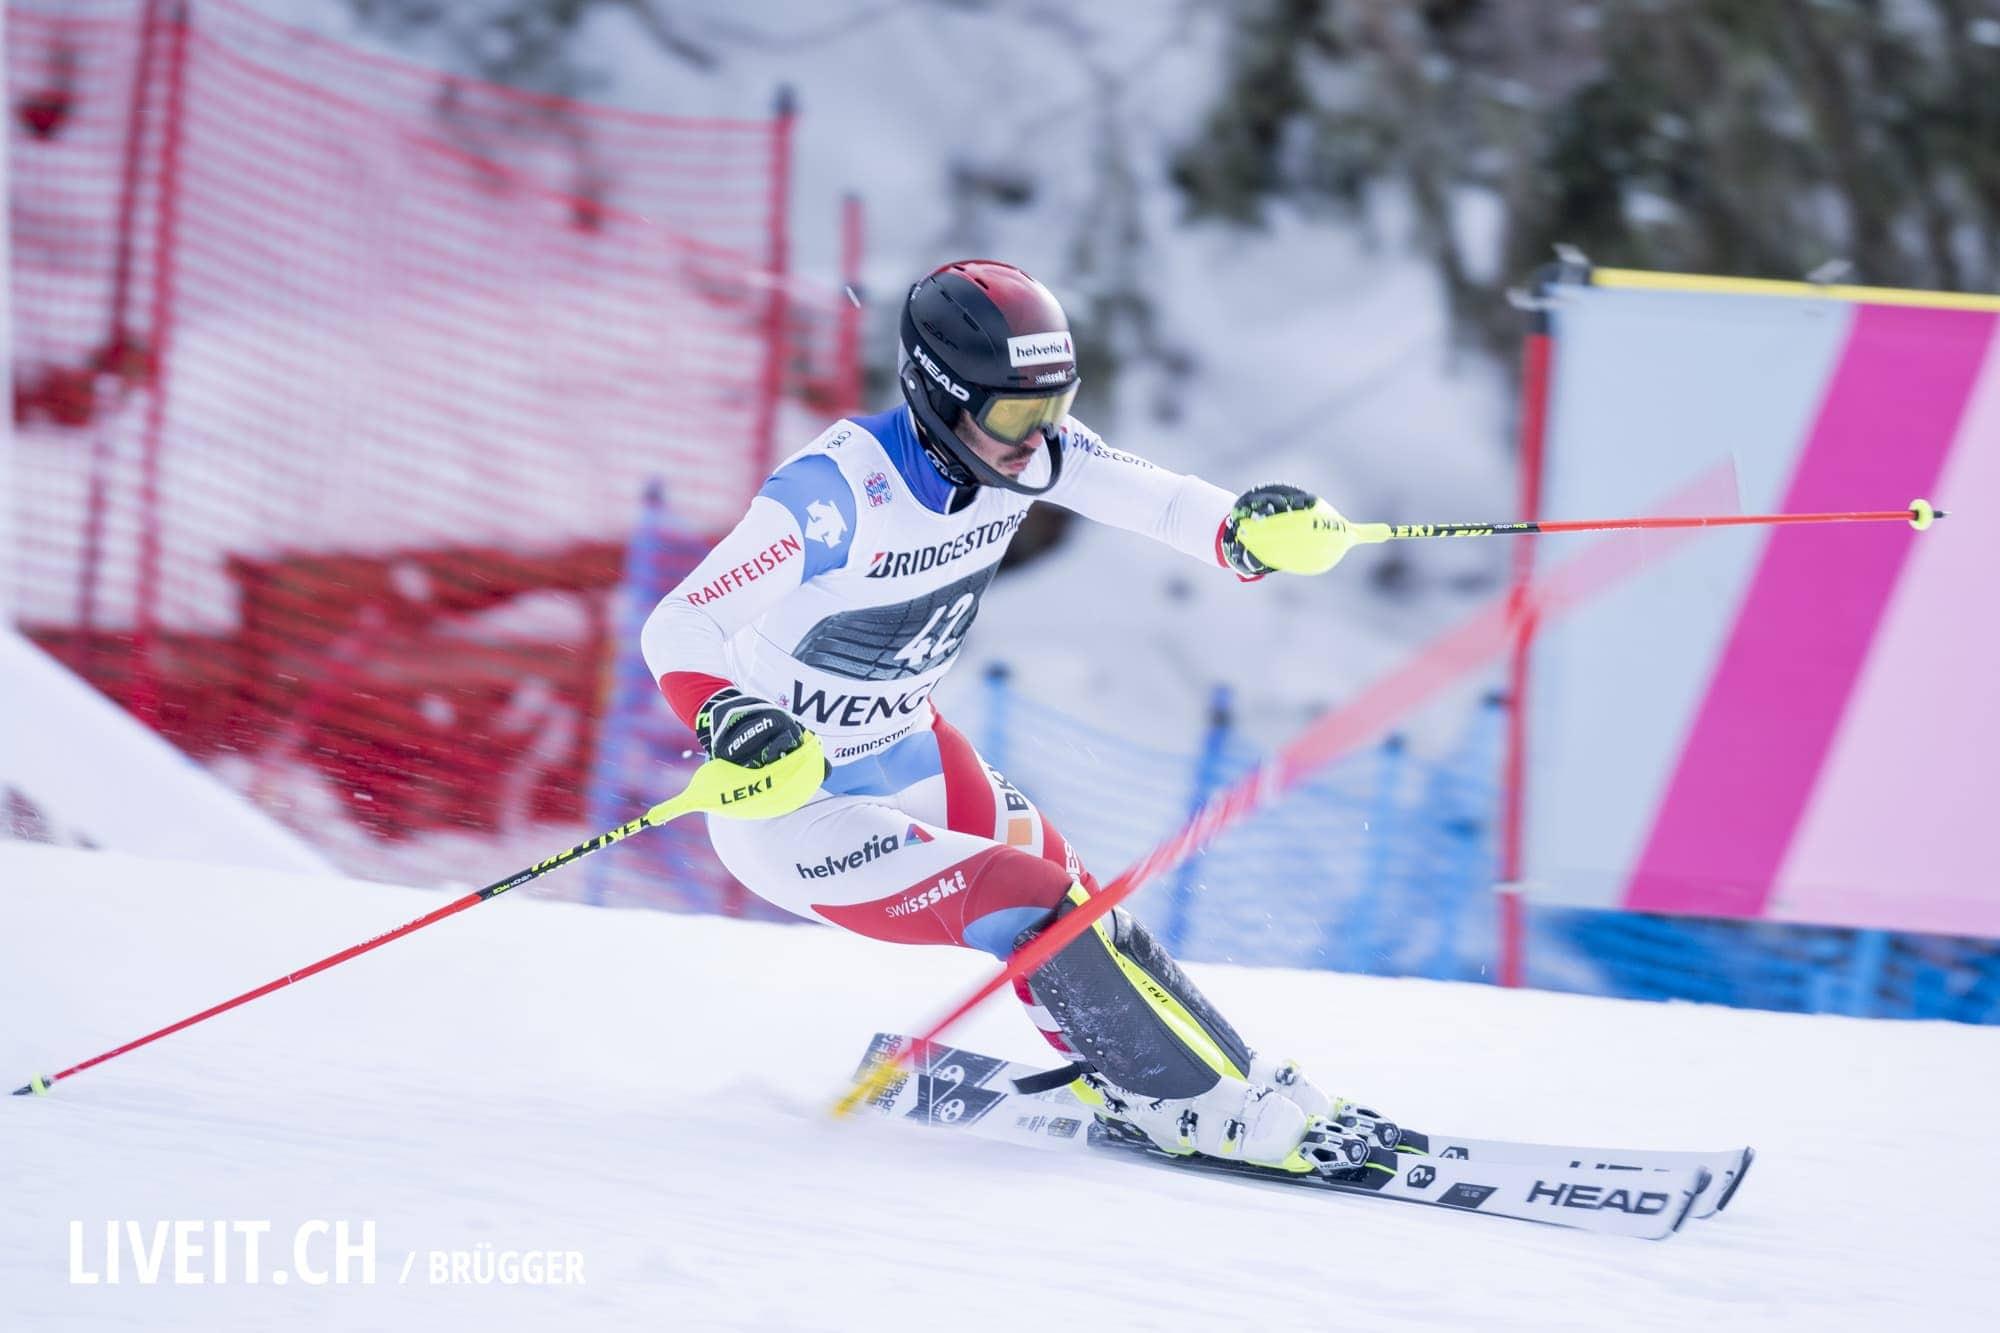 Gilles Roulin (SUI) fotografiert am Freitag, 18. Januar 2019 am Lauberhornrennen in der Disziplin: Slalom Alpine Kombination. (Fotografiert von Dominic Bruegger liveit.ch)